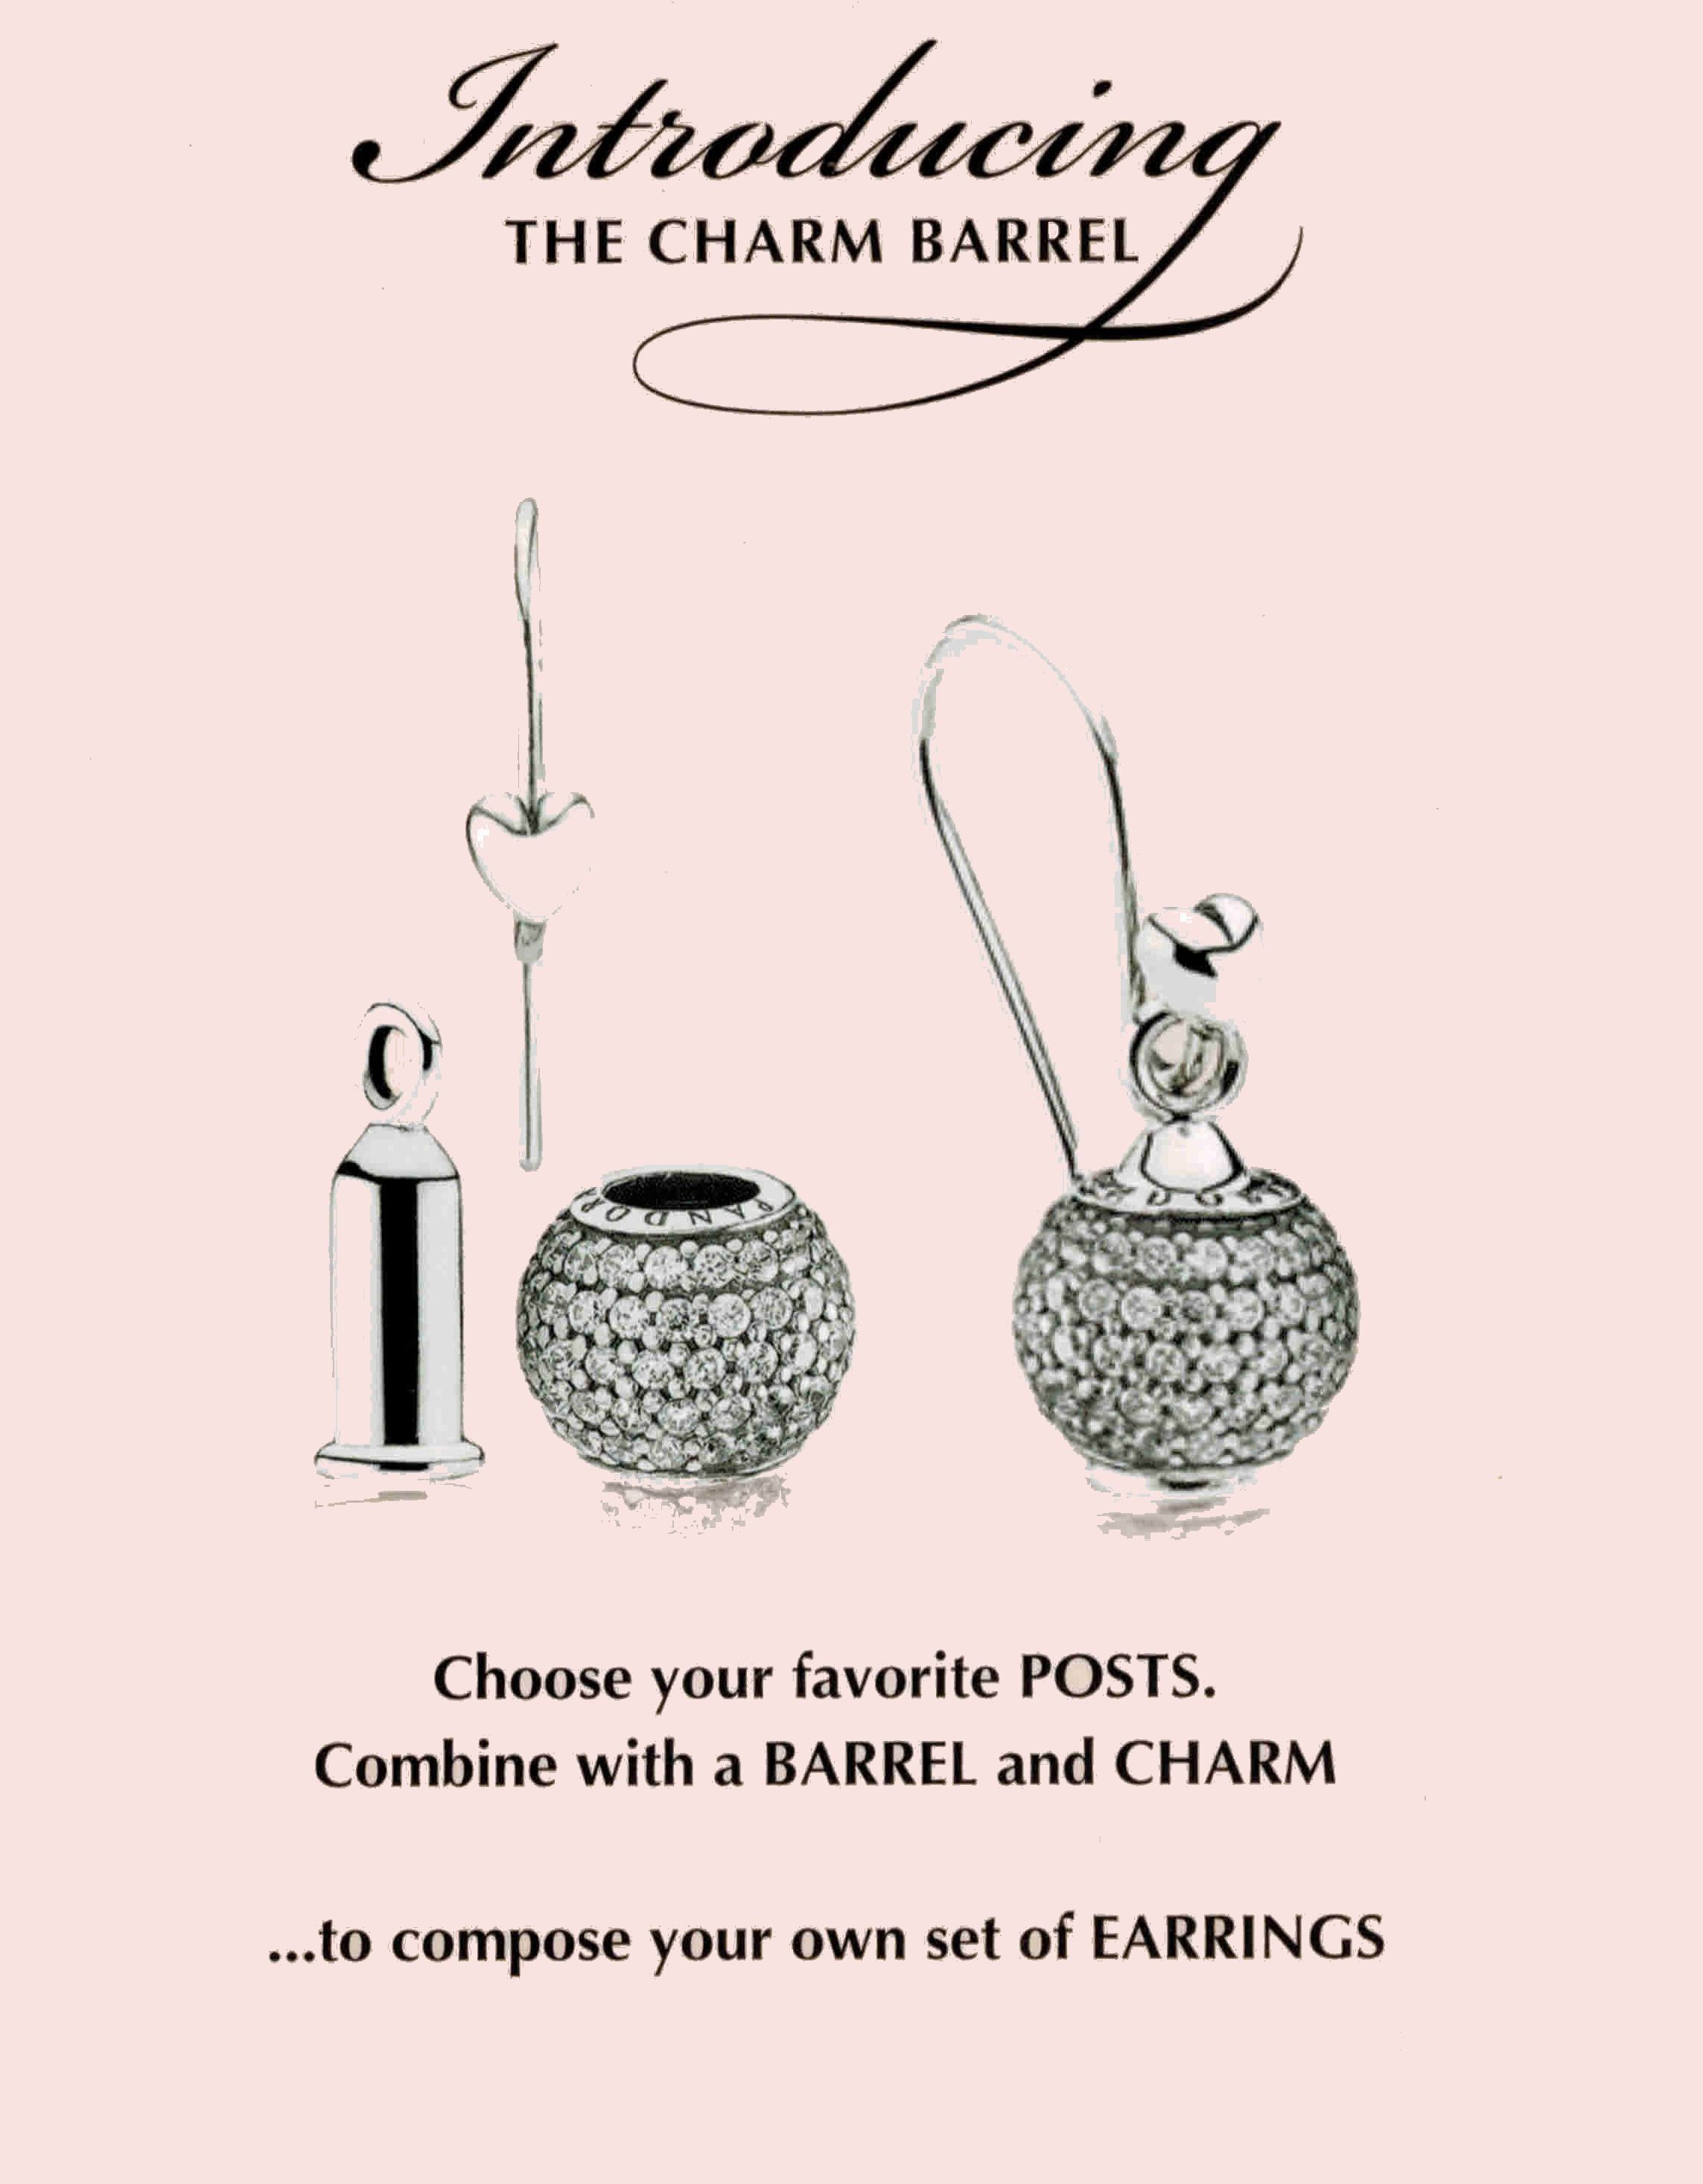 Pandora Charm Barrel Turn Charms Into Earrings